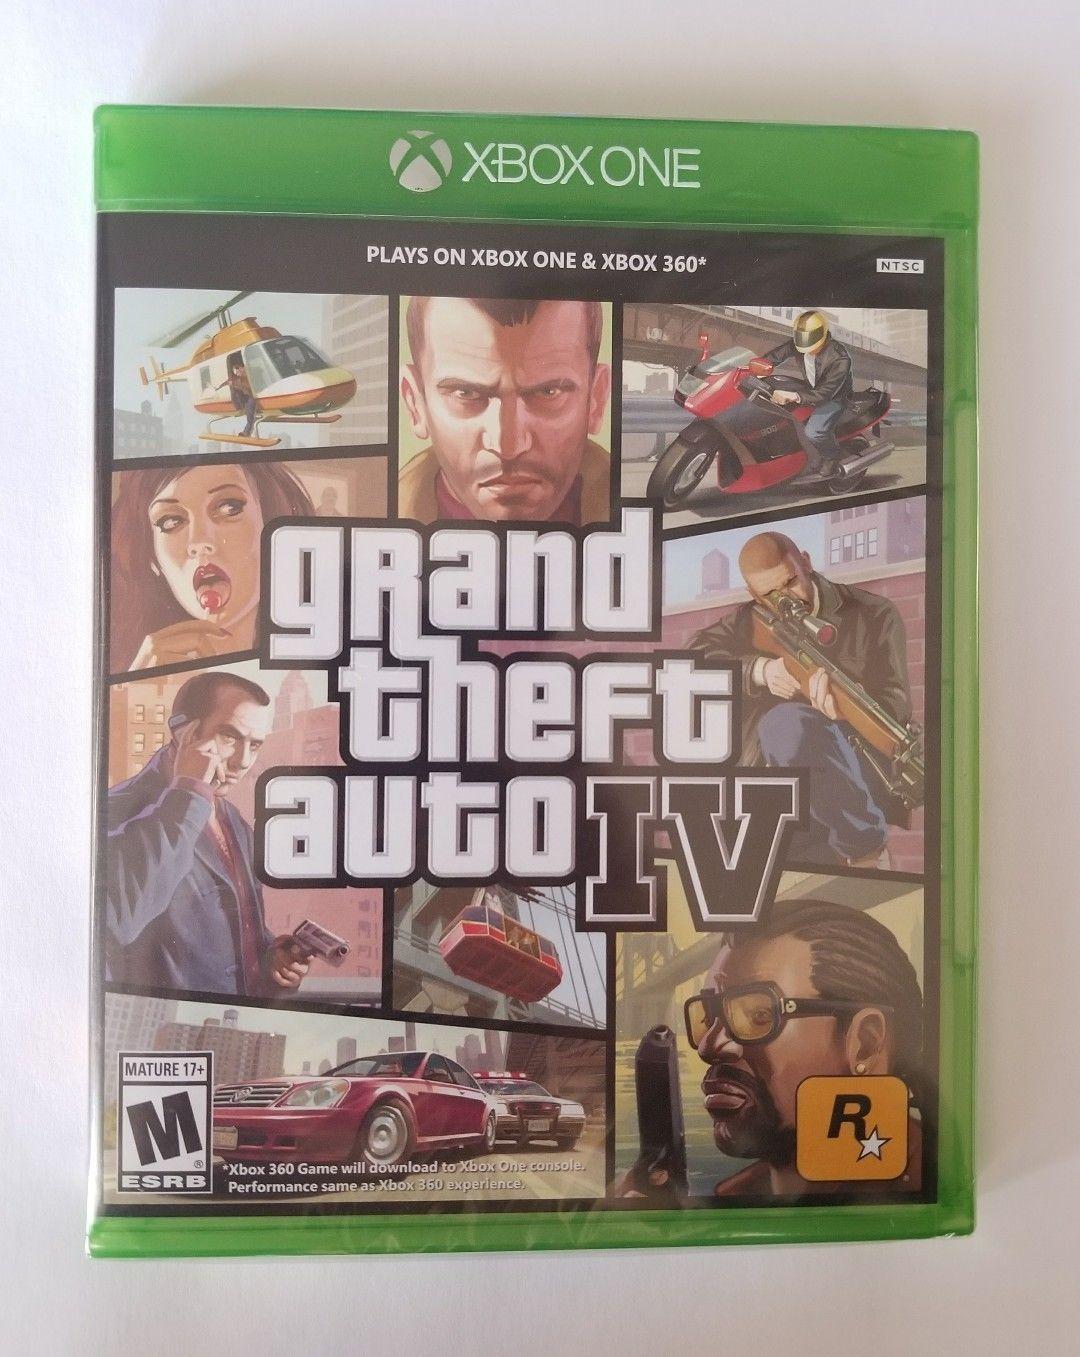 Grand Theft Auto IV GTA 4(XBOX ONE/XBOX 360) Factory Refurbished FREE  Shipping! http://ift.tt/2FkVbf4 #xboxone #xbox360 | Xbox 360, Xbox, Grand  theft auto